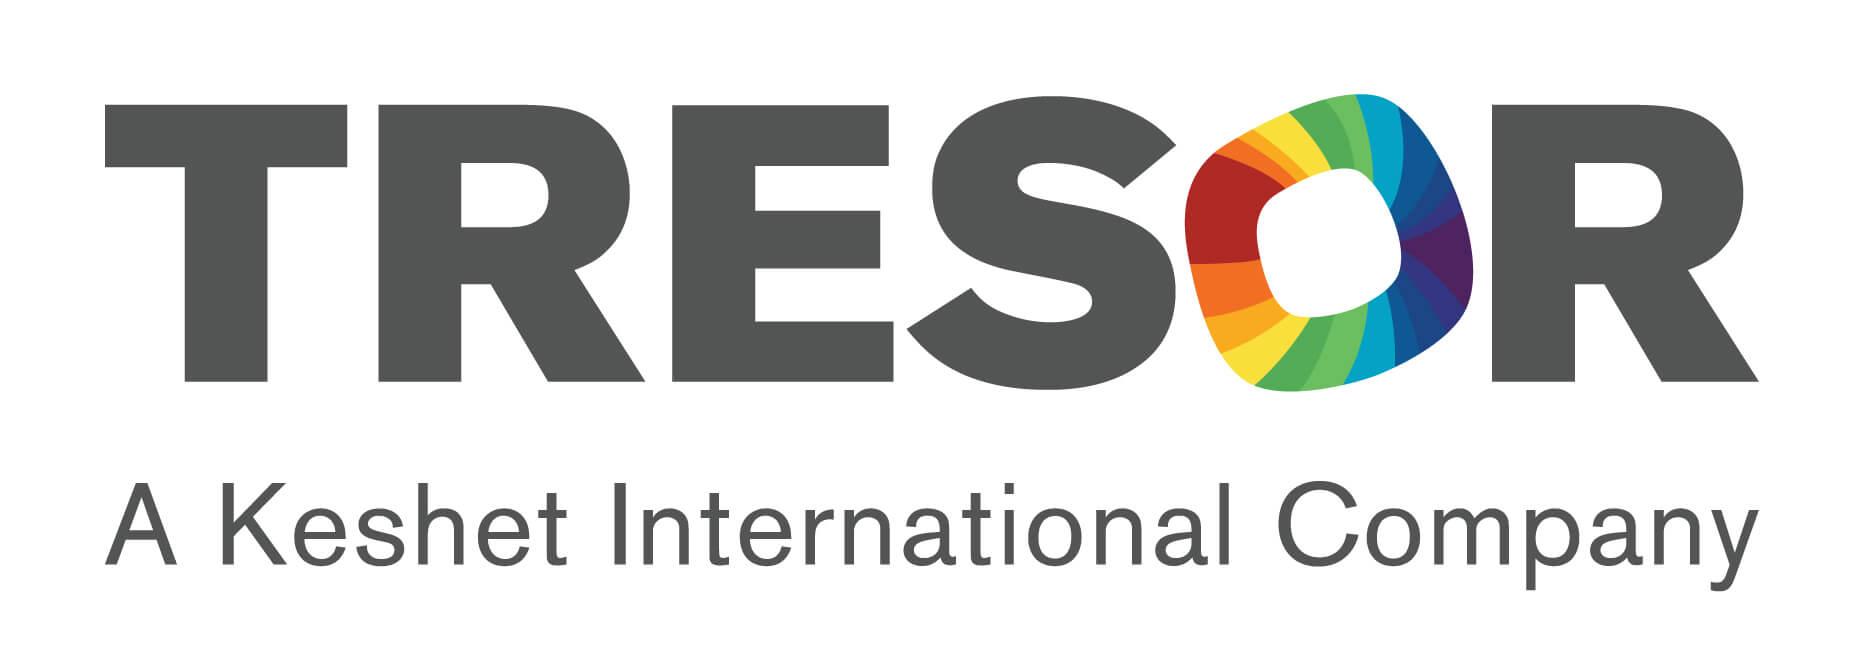 Tresor TV Produktions GmbH